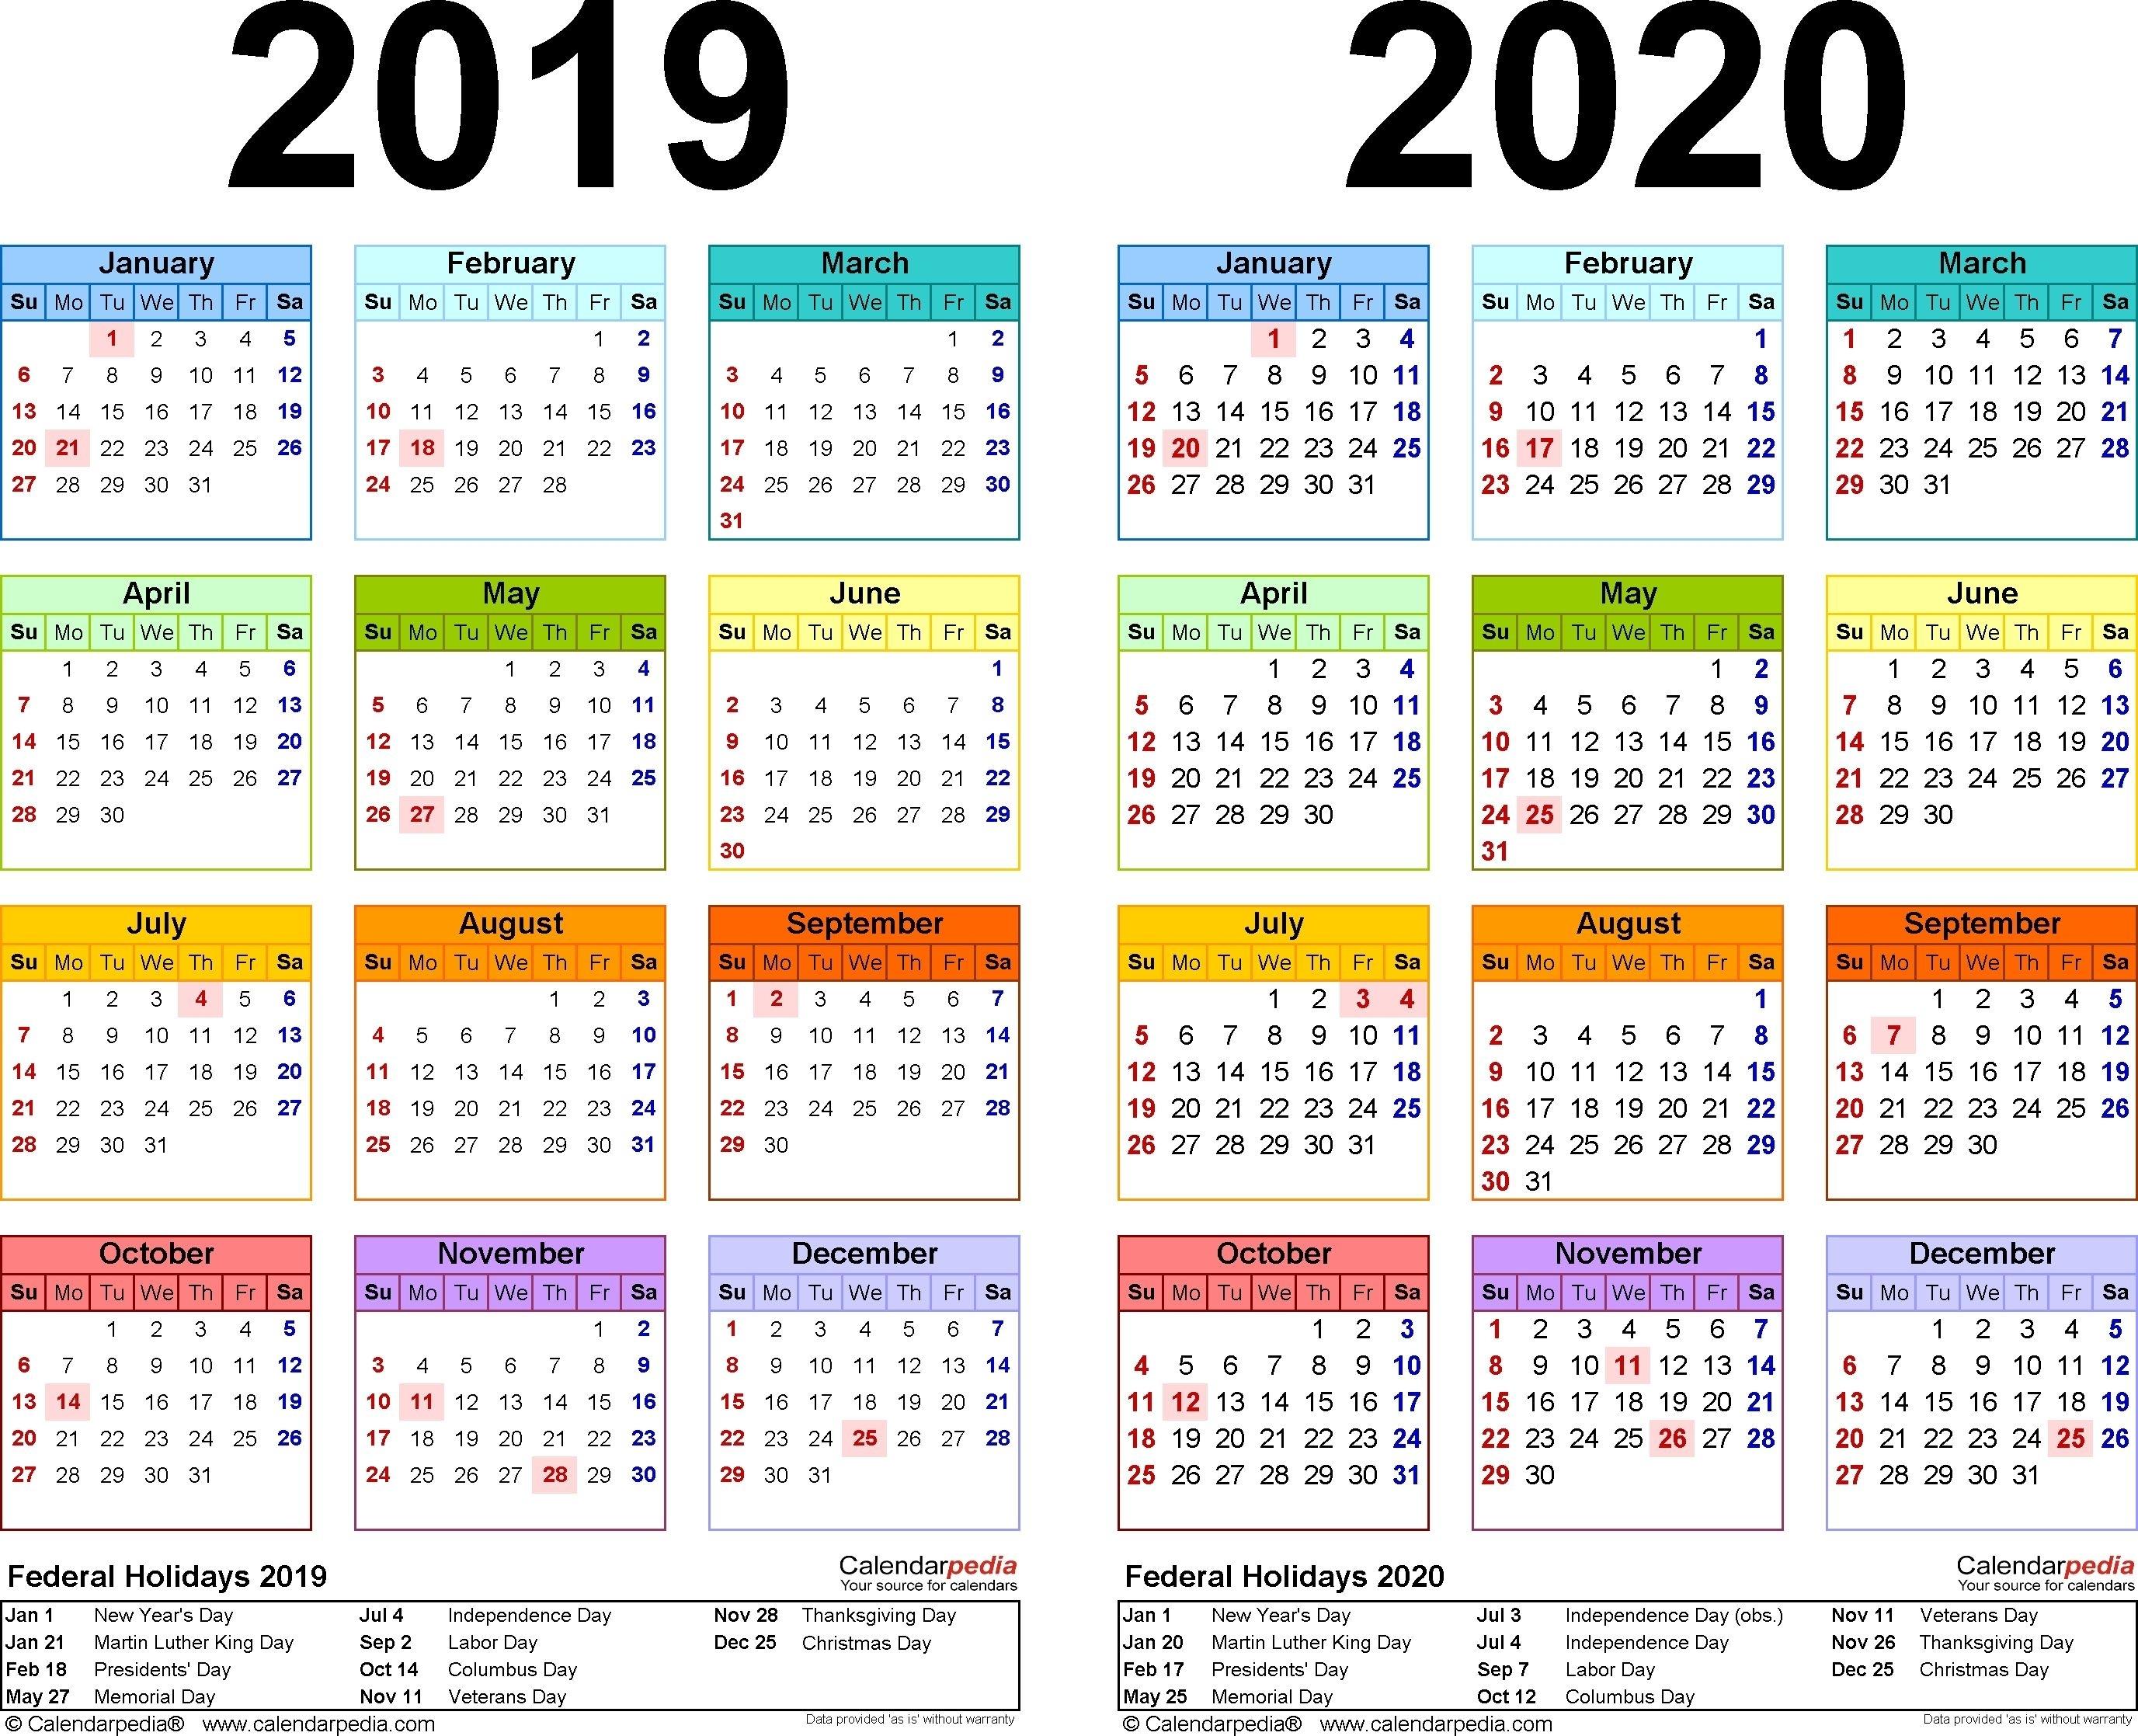 2019-2020 Calendar - Free Printable Two-Year Pdf Calendars within Free Printable Academic Calendar 2019-2020